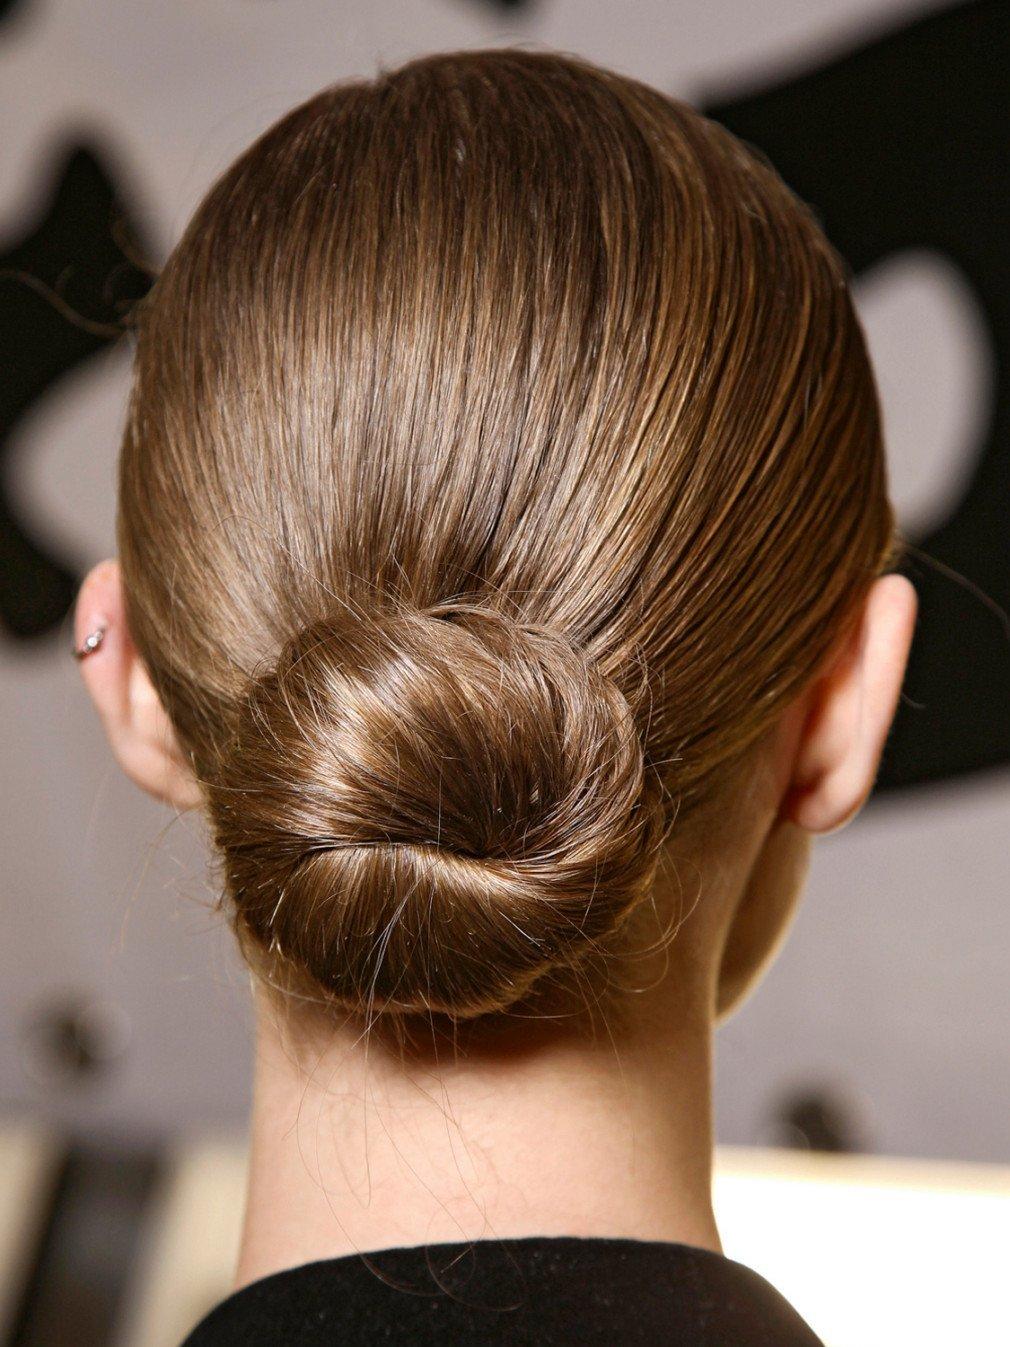 бесплатно картинки шишка волосы этом городе стефана